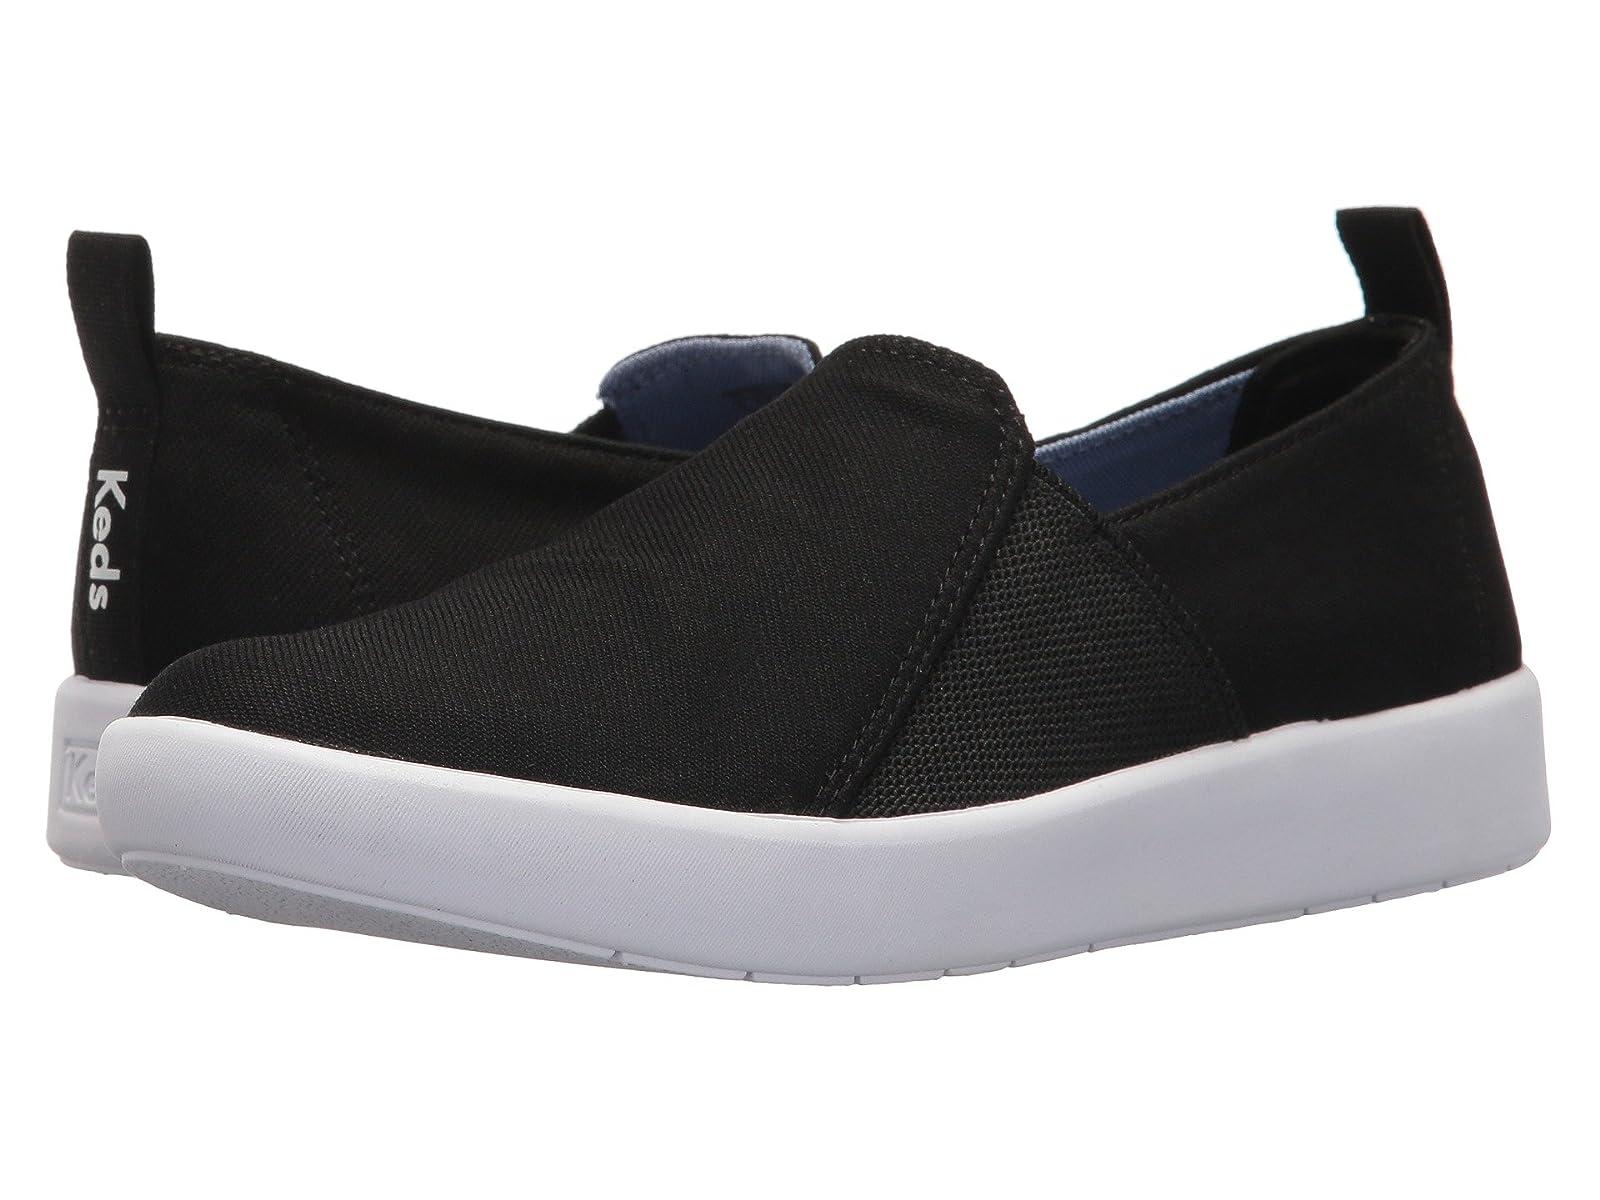 Keds Studio Liv Studio JerseyCheap and distinctive eye-catching shoes